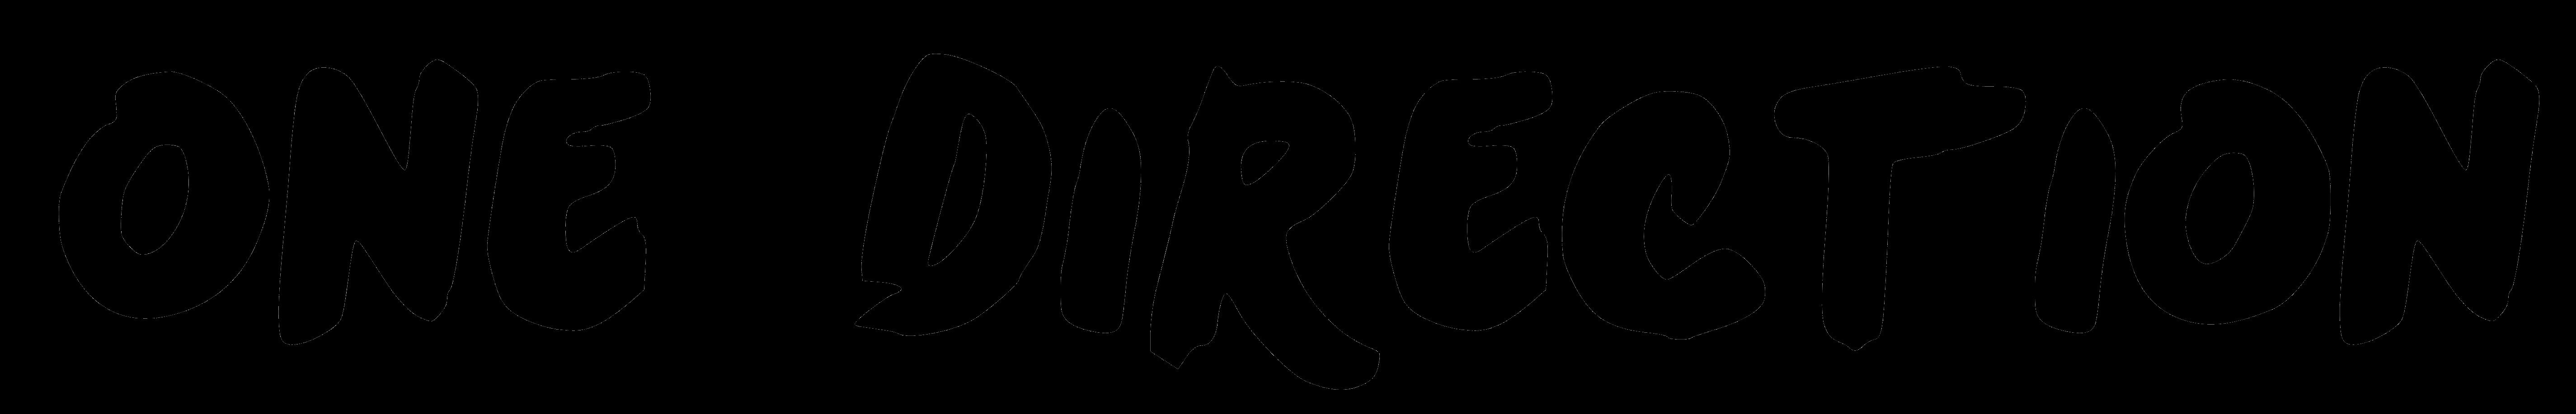 one direction logo transparent background wwwpixshark